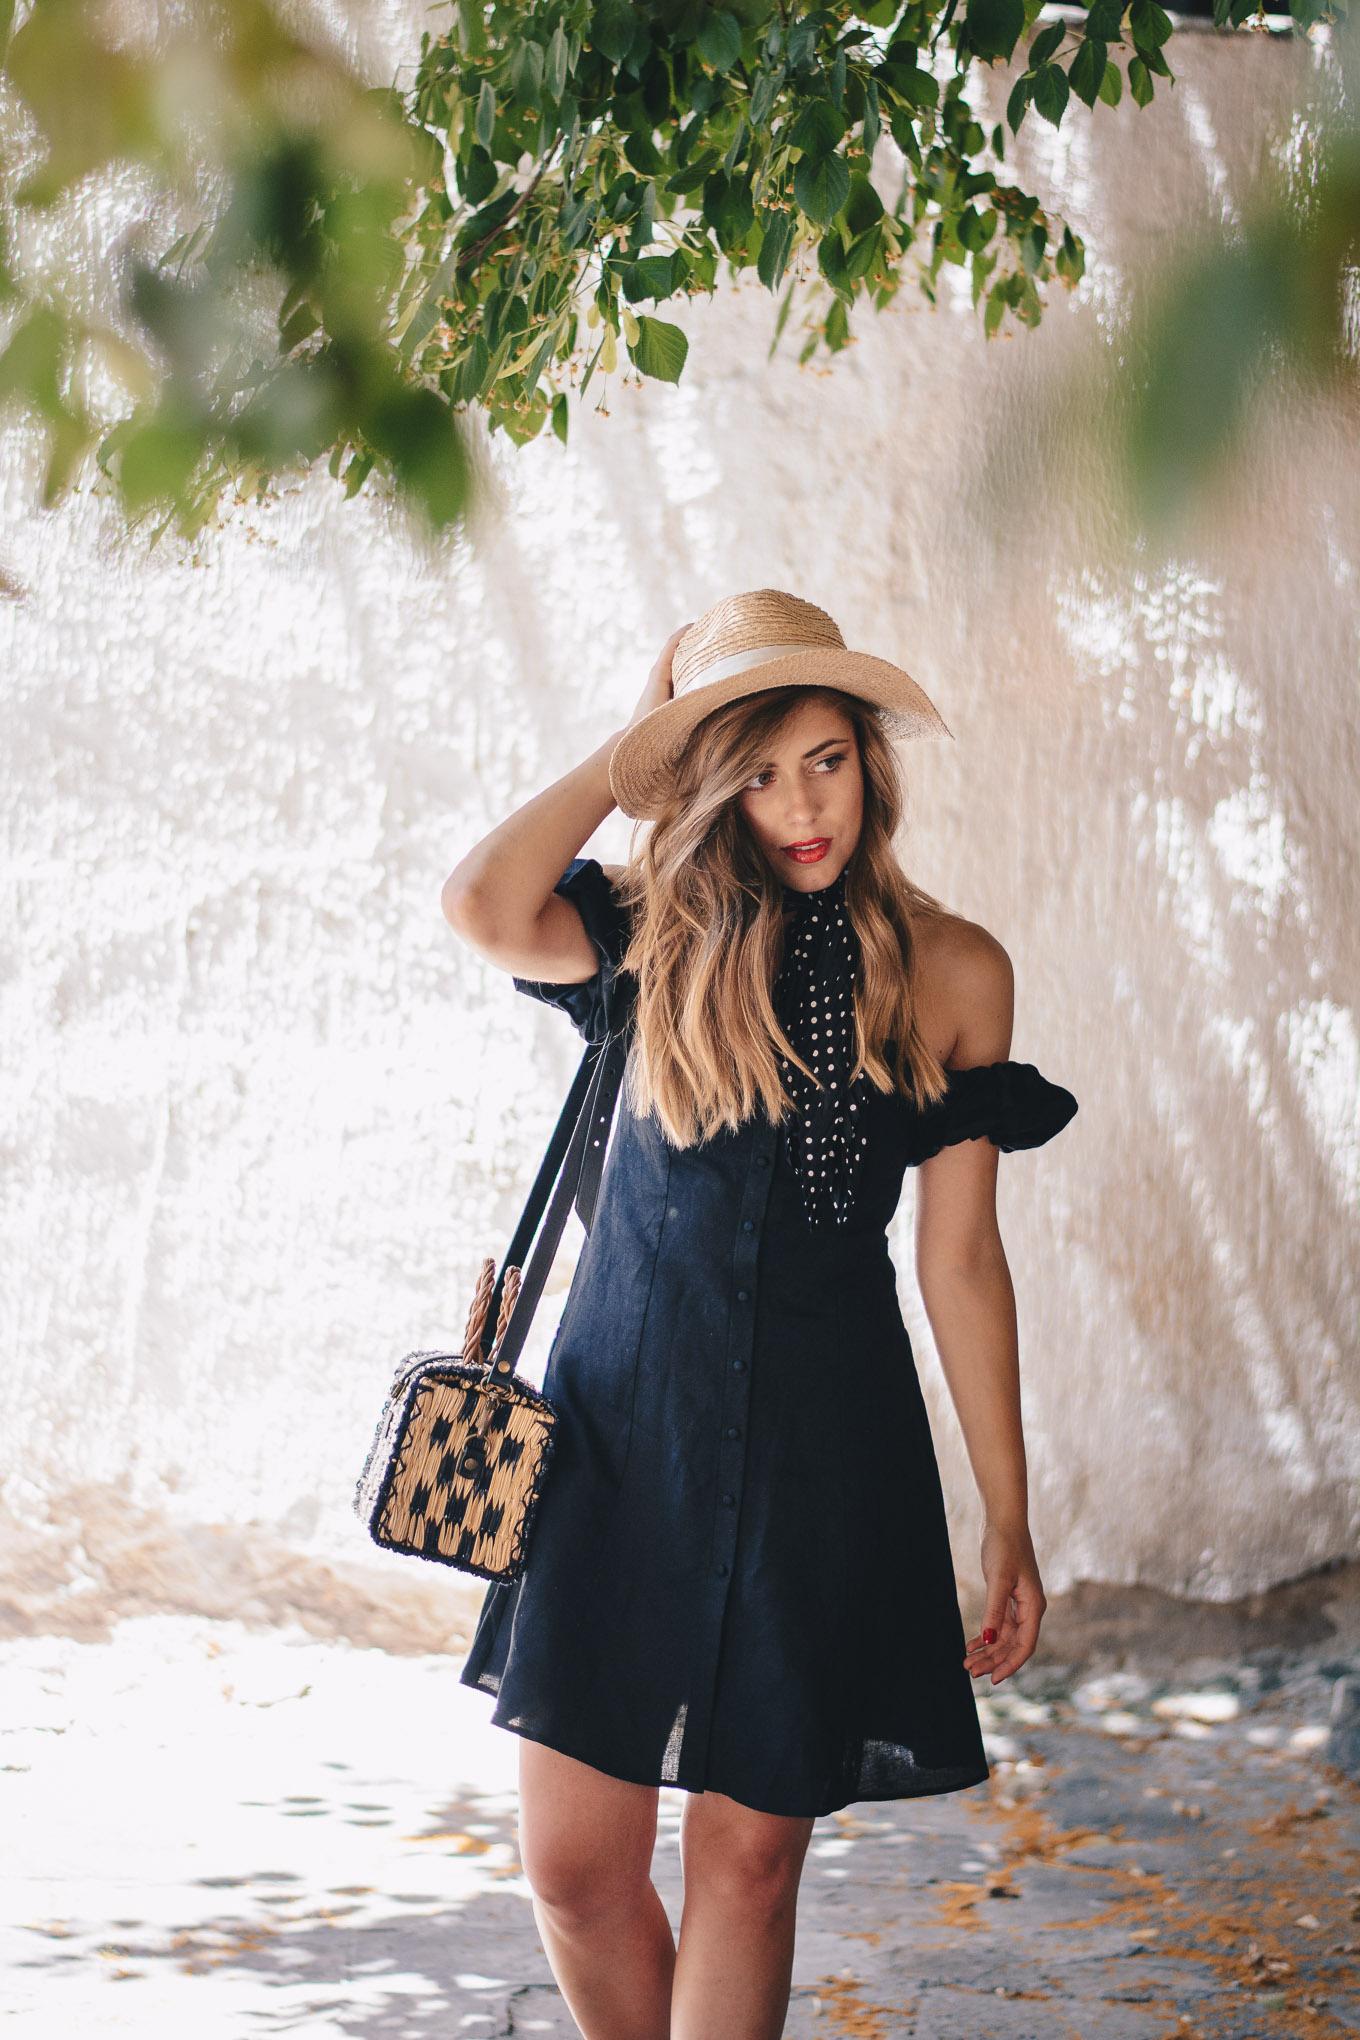 Wearing Zara dress